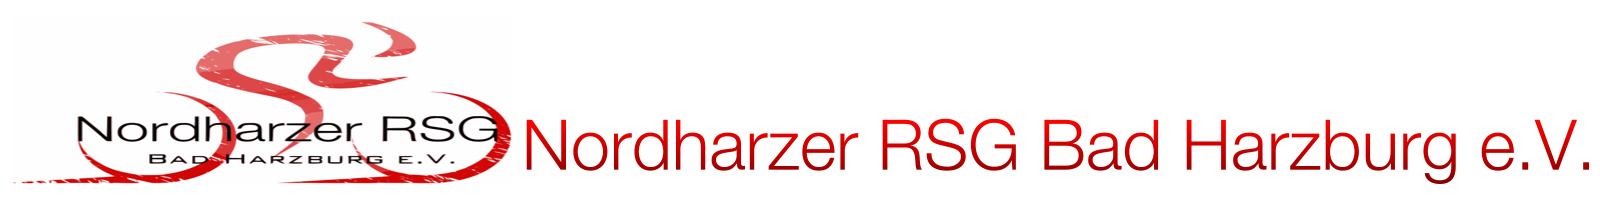 Nordharzer RSG Bad Harzburg e.V.